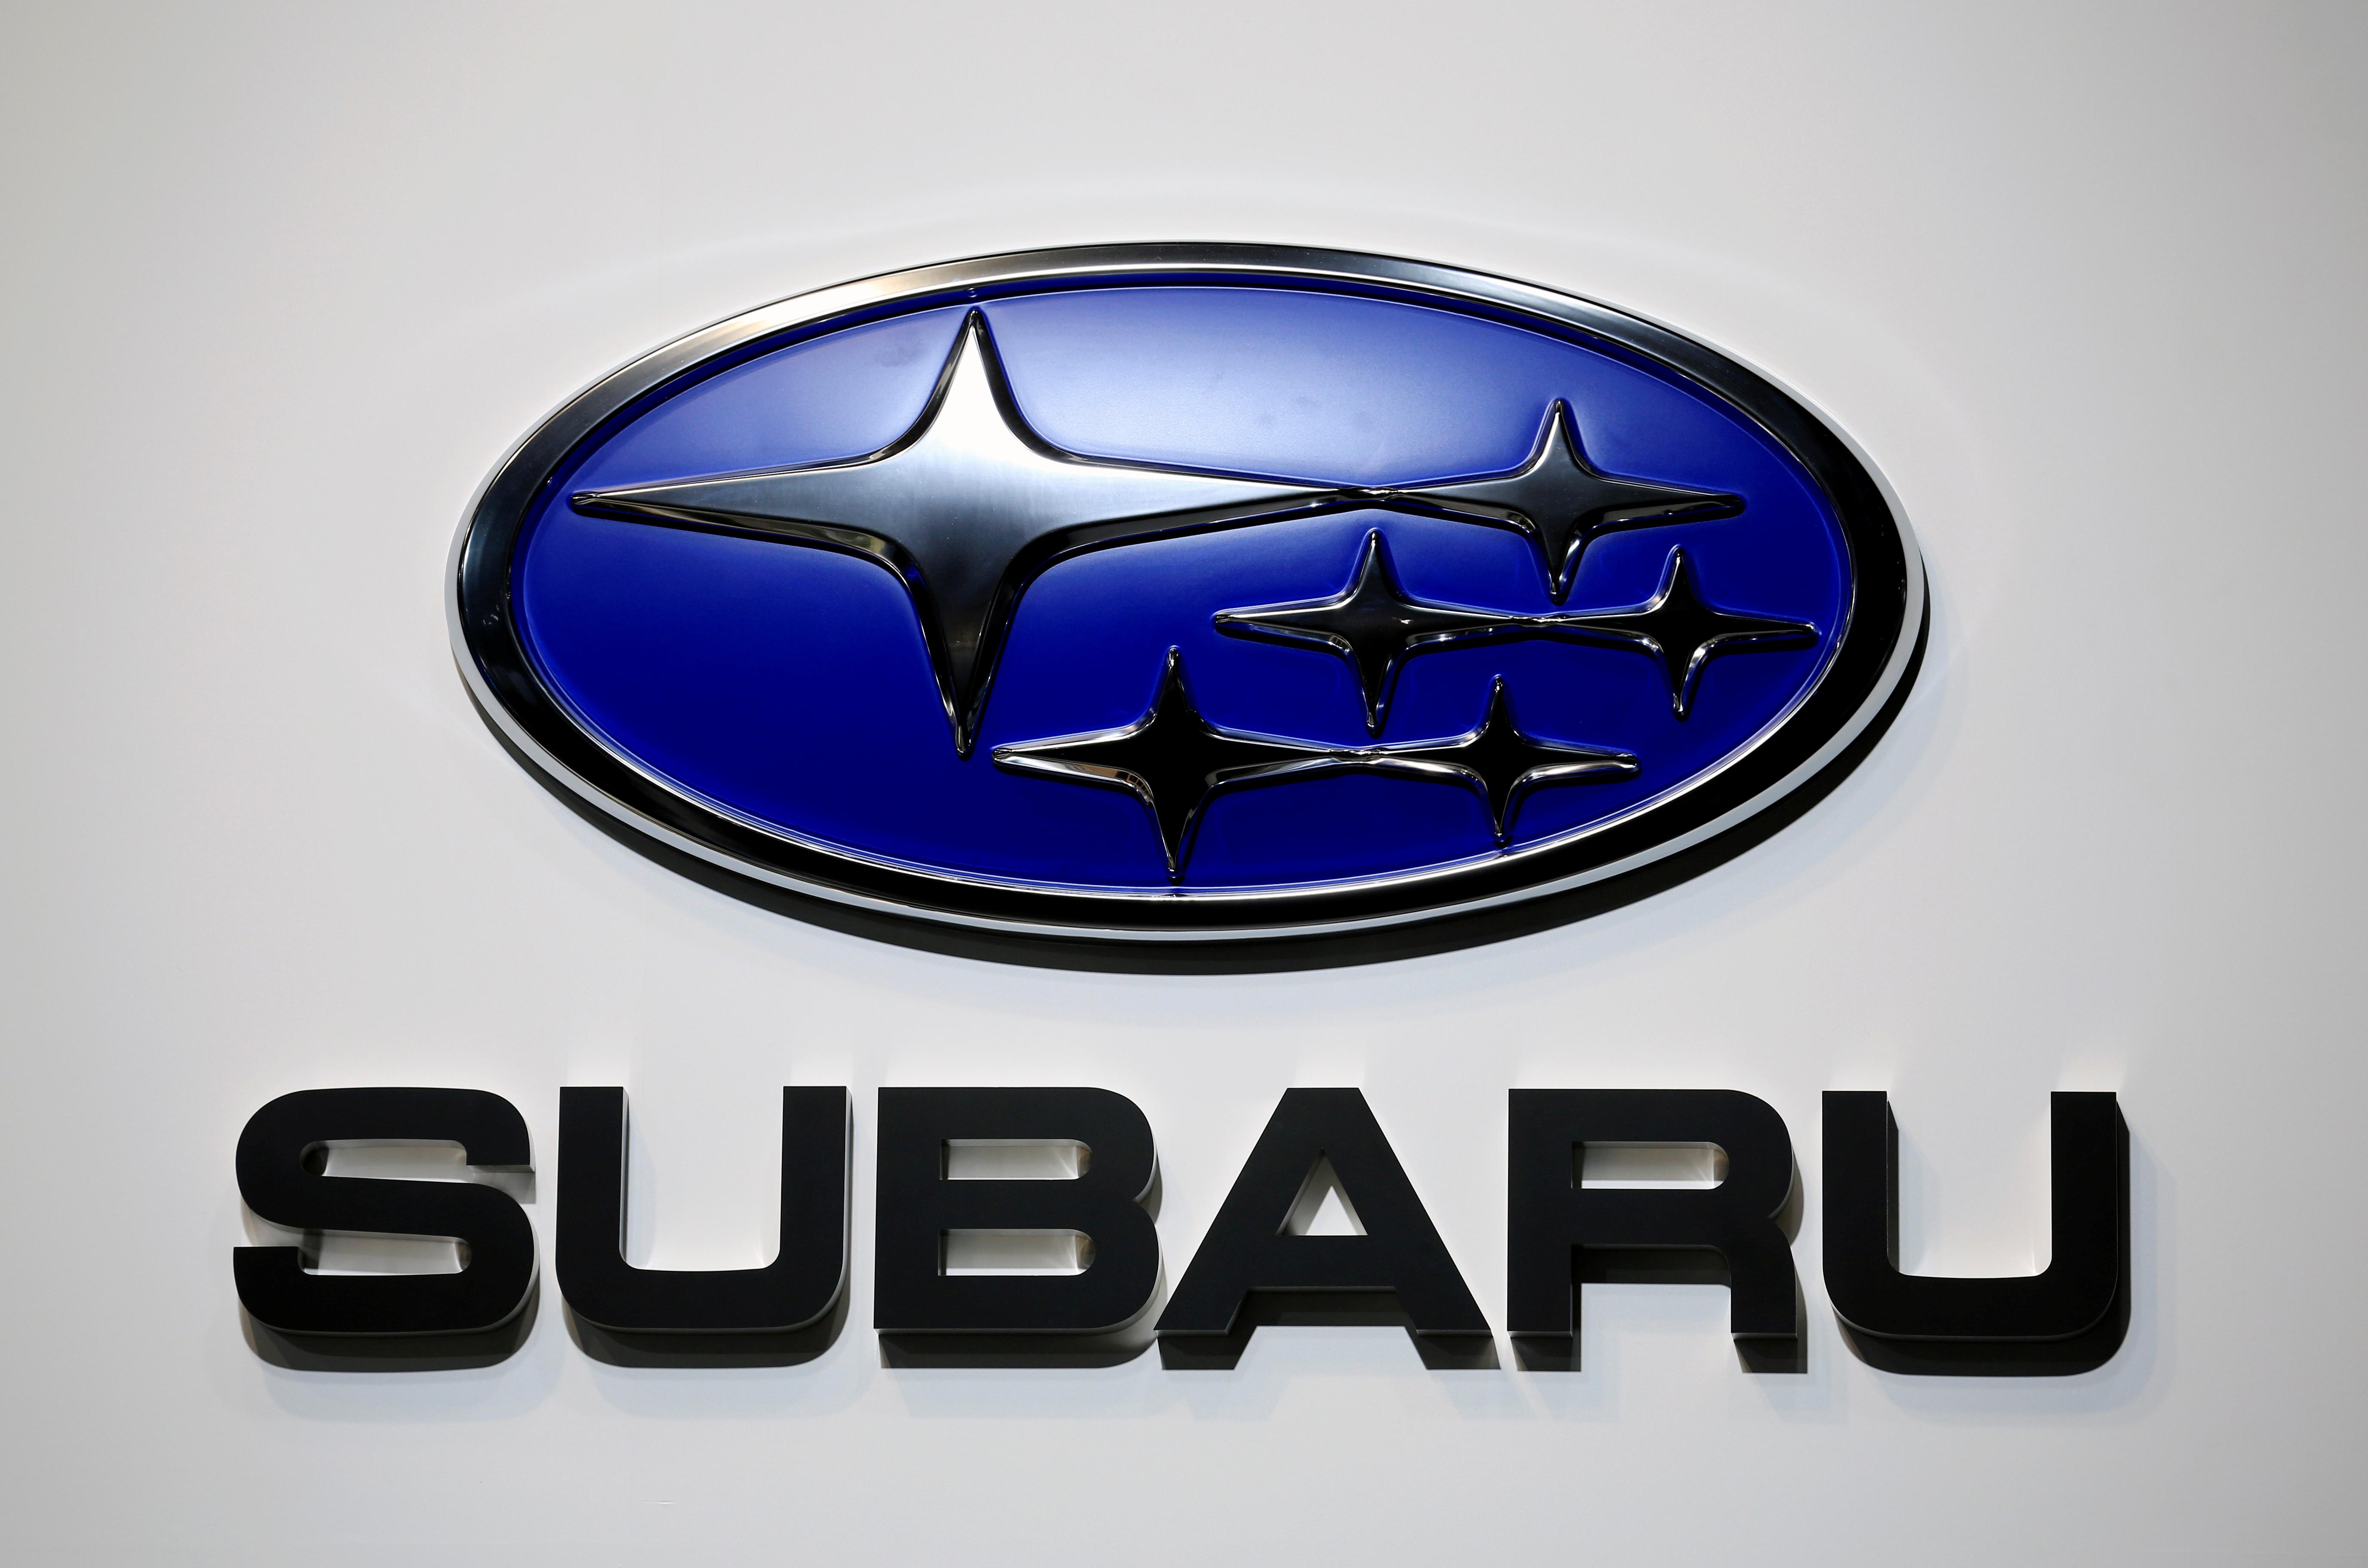 A Subaru logo is displayed at the Tokyo Motor Show, in Tokyo, Japan October 23, 2019. REUTERS/Soe Zeya Tun